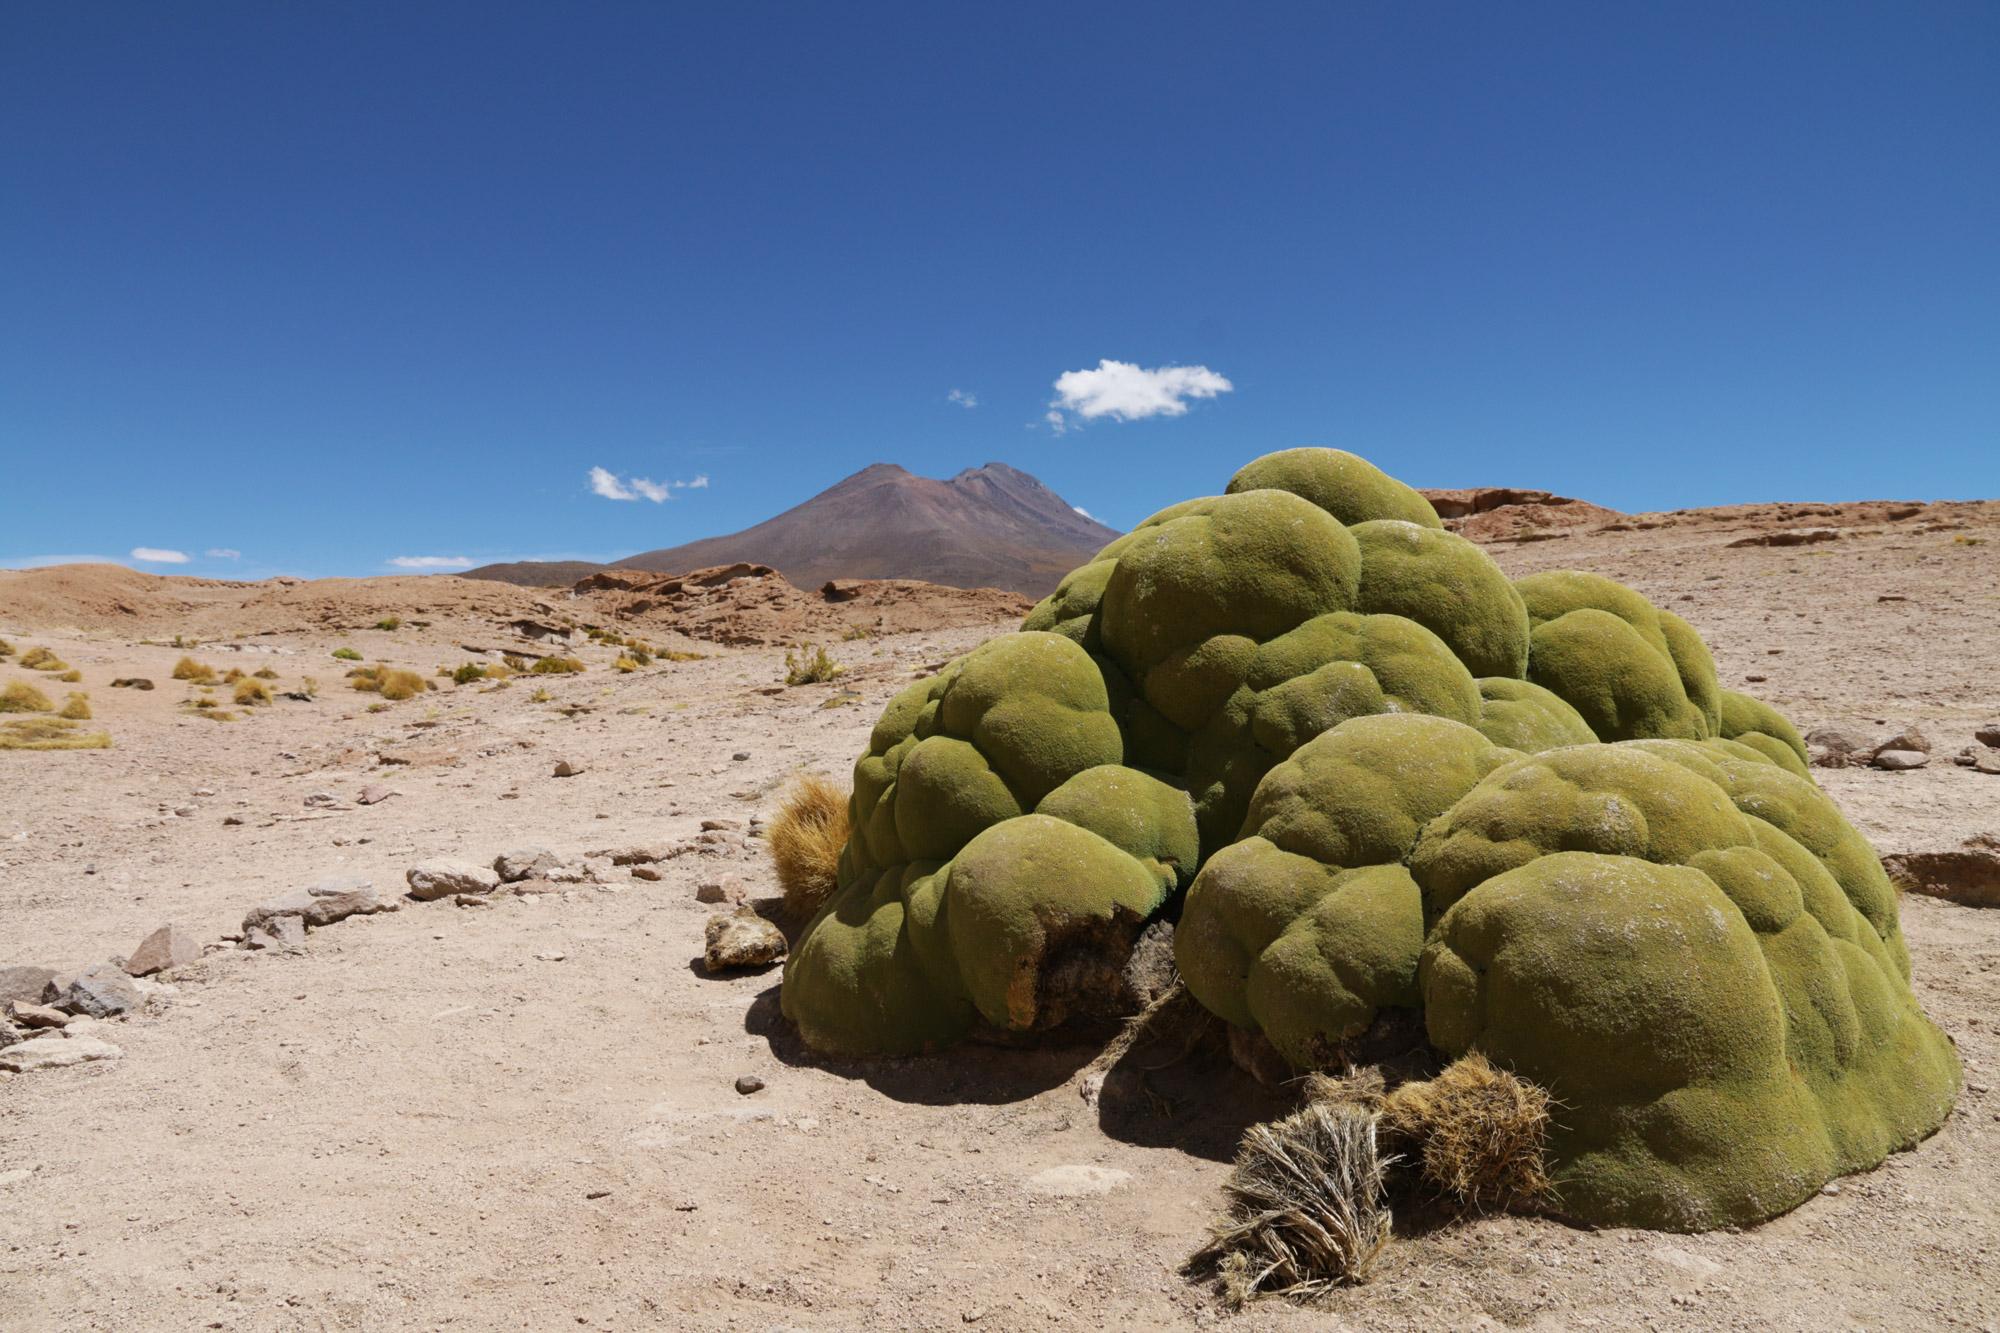 Reisverslag Bolivia: 's wereld grootste zoutvlakte - Bijzonder mos